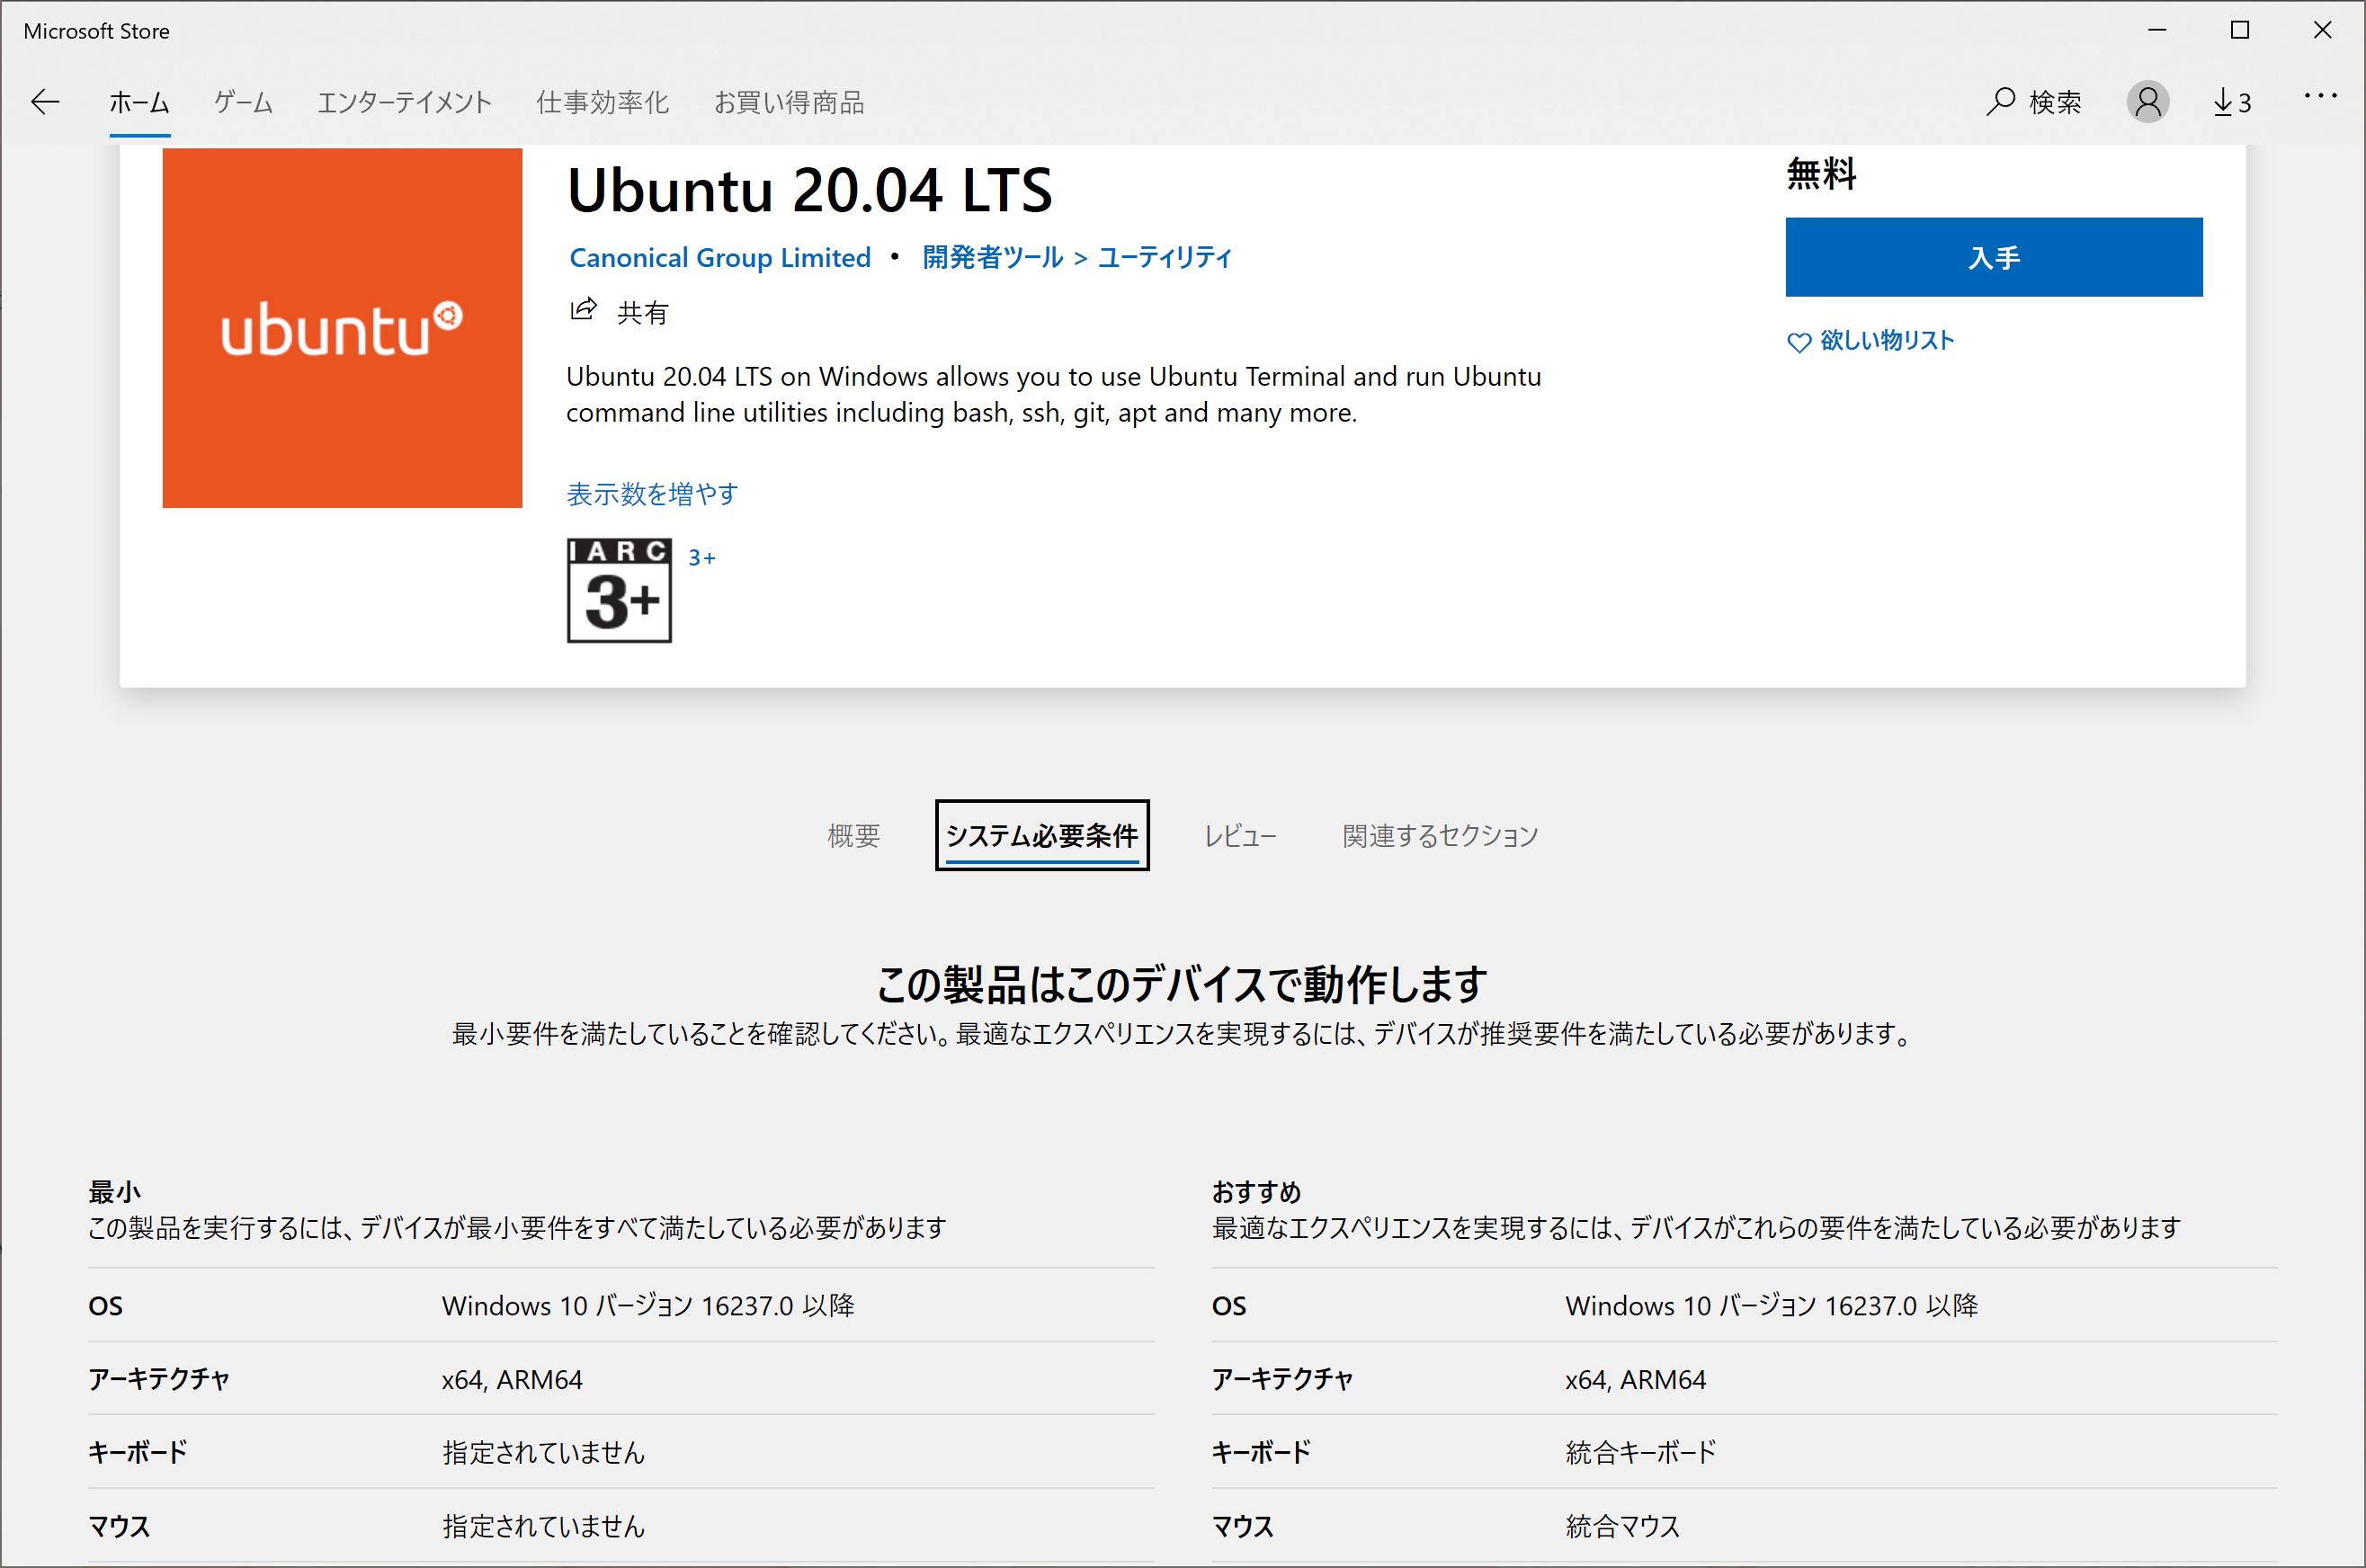 Microsoft Storeの「Ubuntu 20.04 LTS」のシステム必要条件